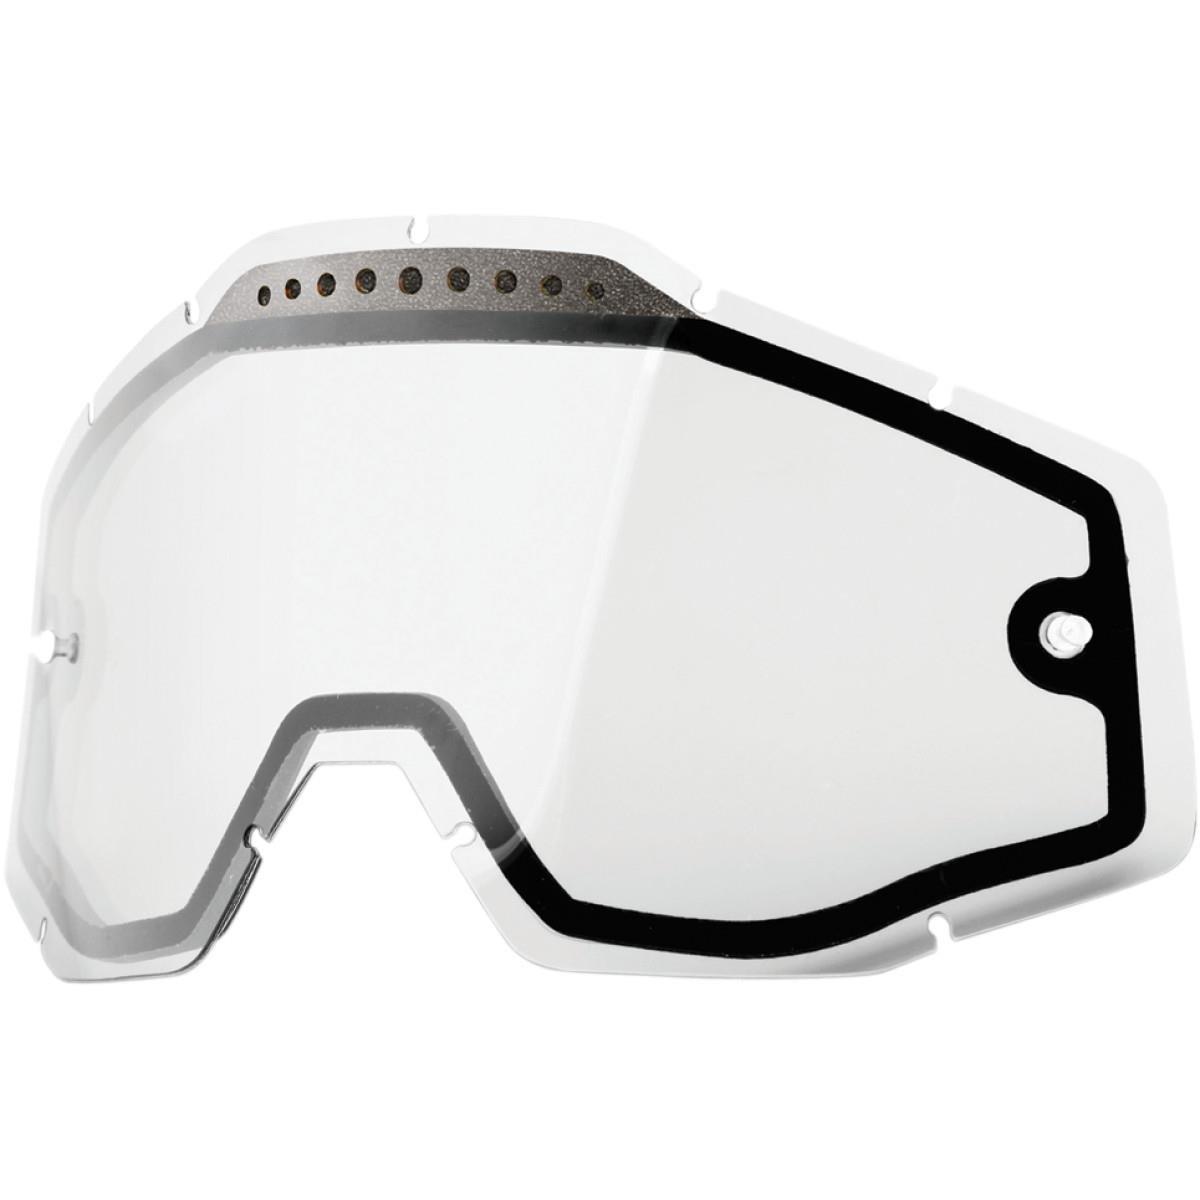 100% Race Craft/Accuri/Strata Vented Dual Pane lente de Anti Niebla, Clear, One size 51006-010-02